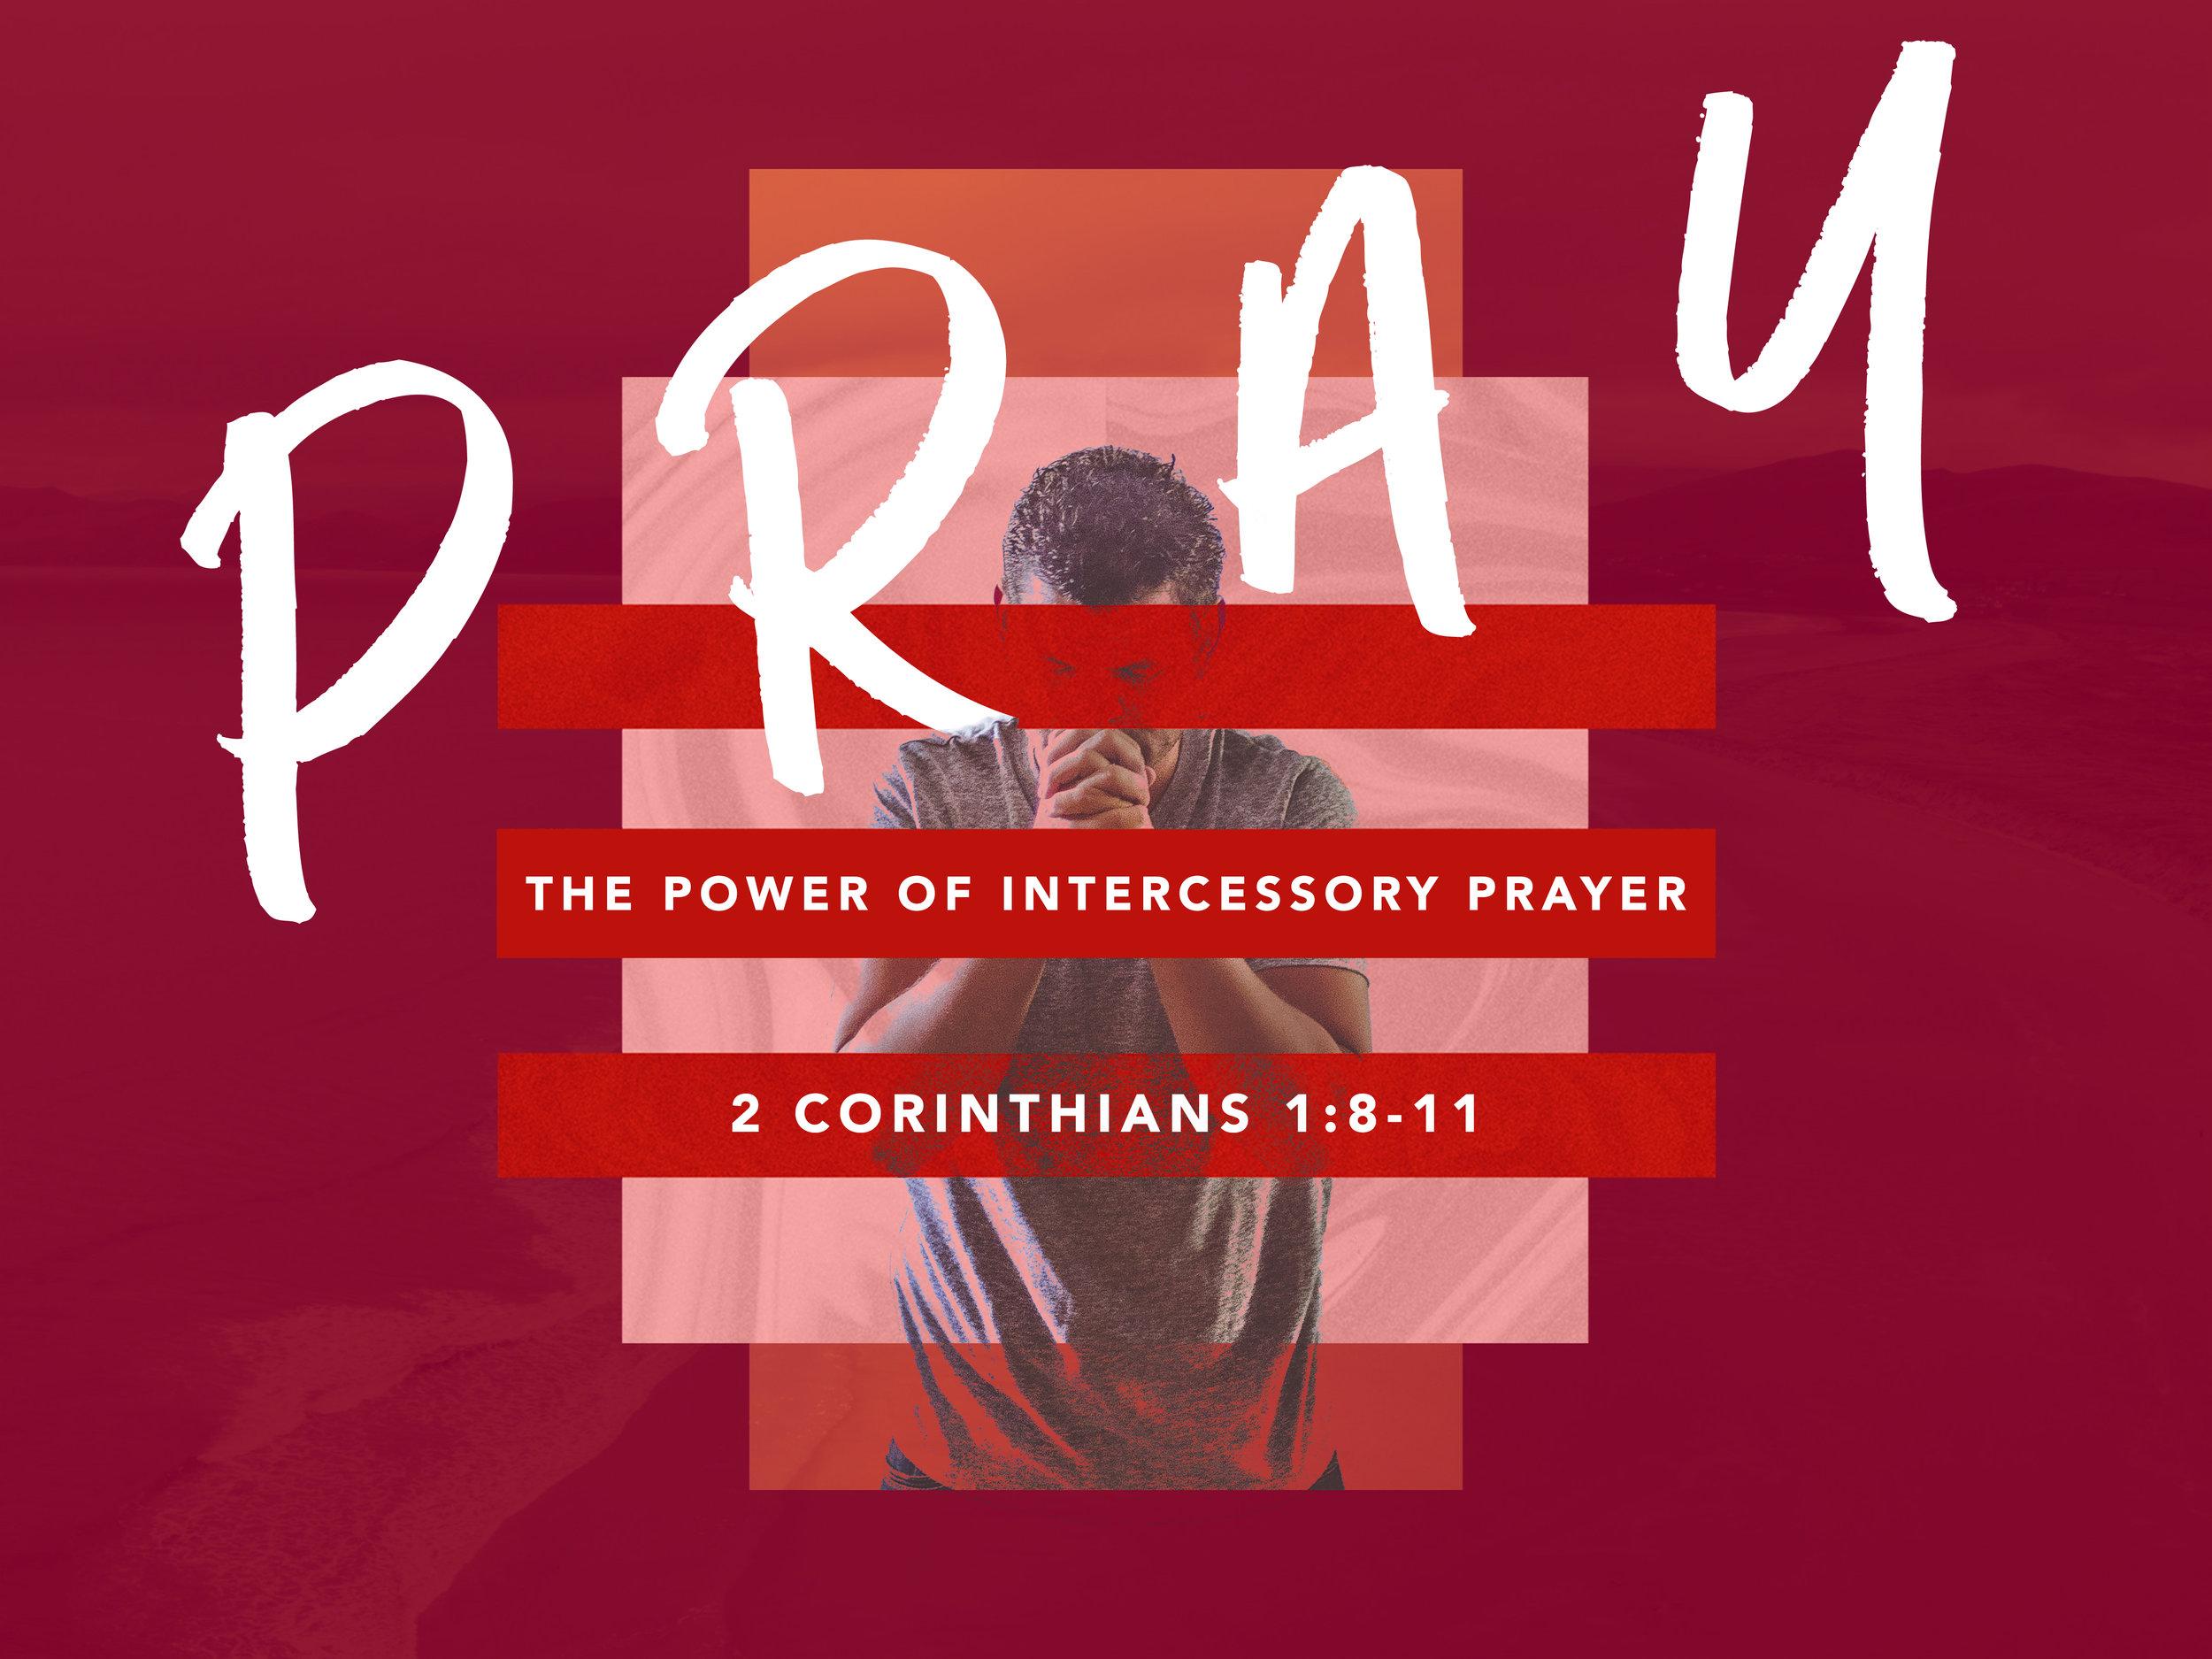 THE POWER OF INTERCESSORY PRAYER TITLE.jpg